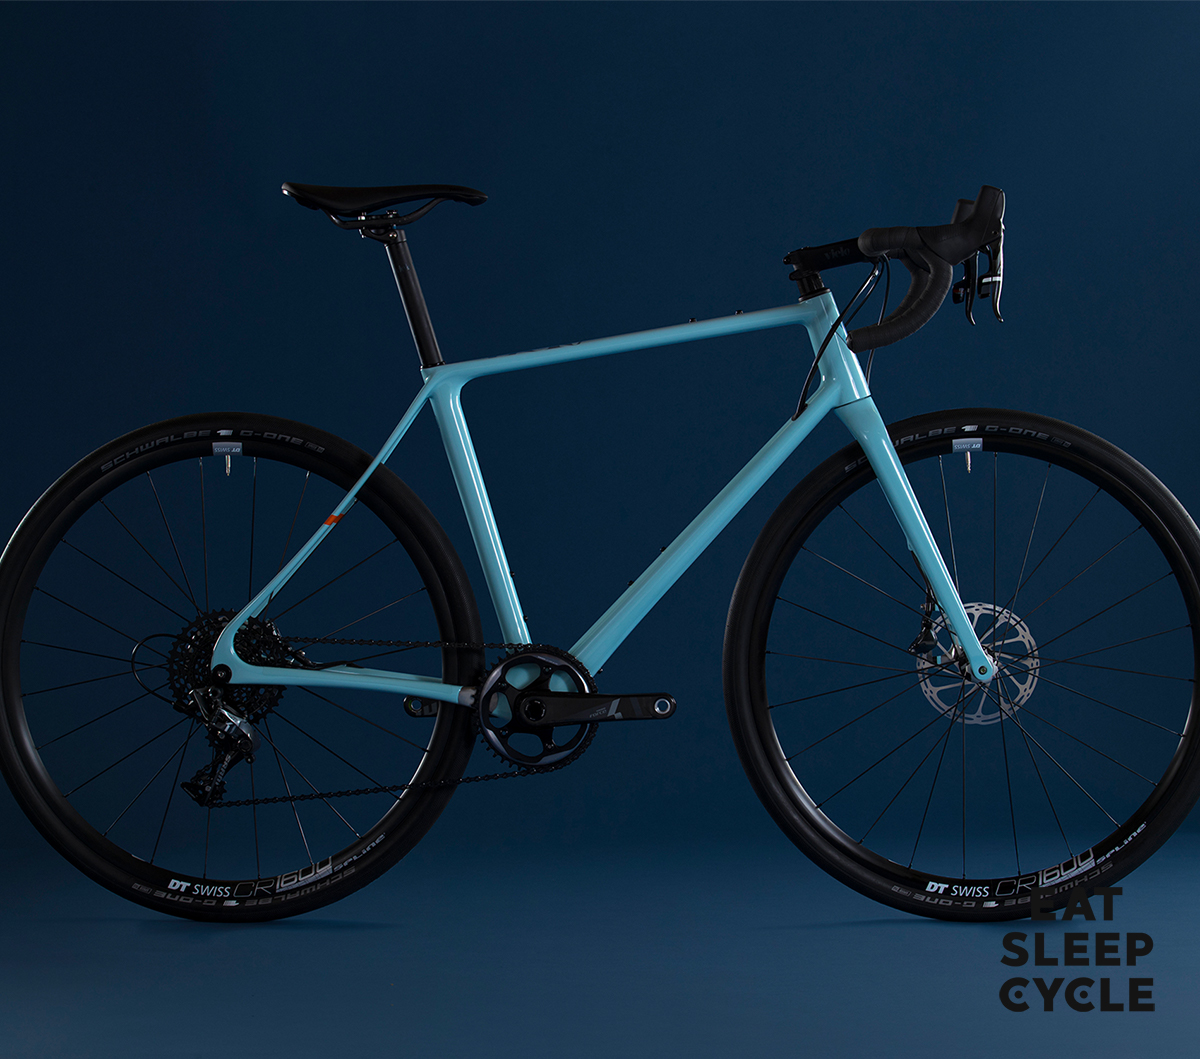 Eat-Sleep-Cycle-Cycling-Girona-Bike-Vielo-v1g1